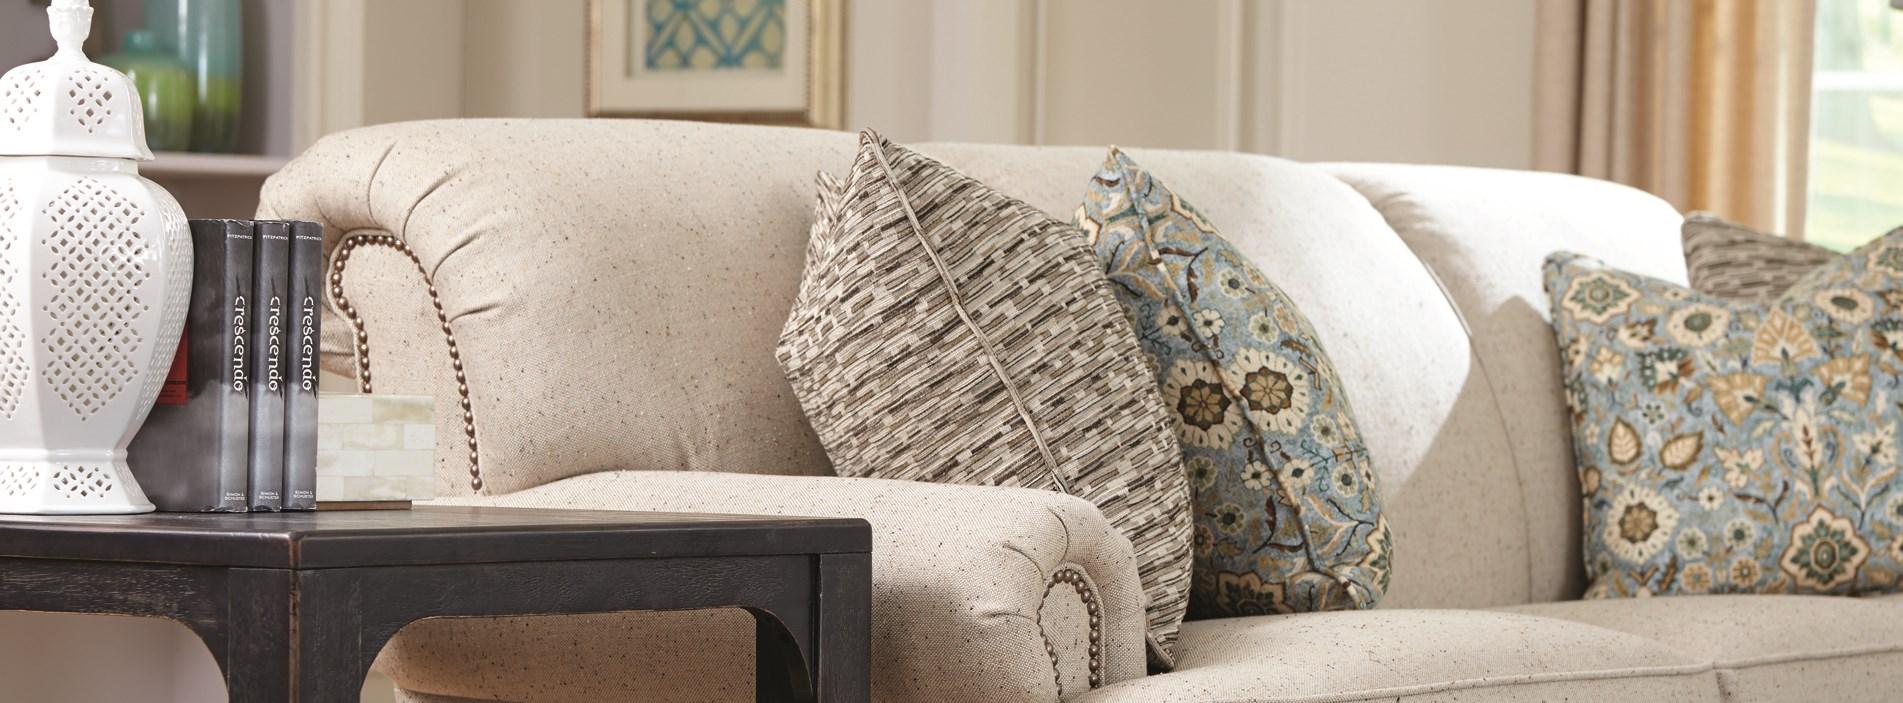 louis mohana furniture houma thibodaux new orleans bourg terrebonne tri parish lafayette. Black Bedroom Furniture Sets. Home Design Ideas